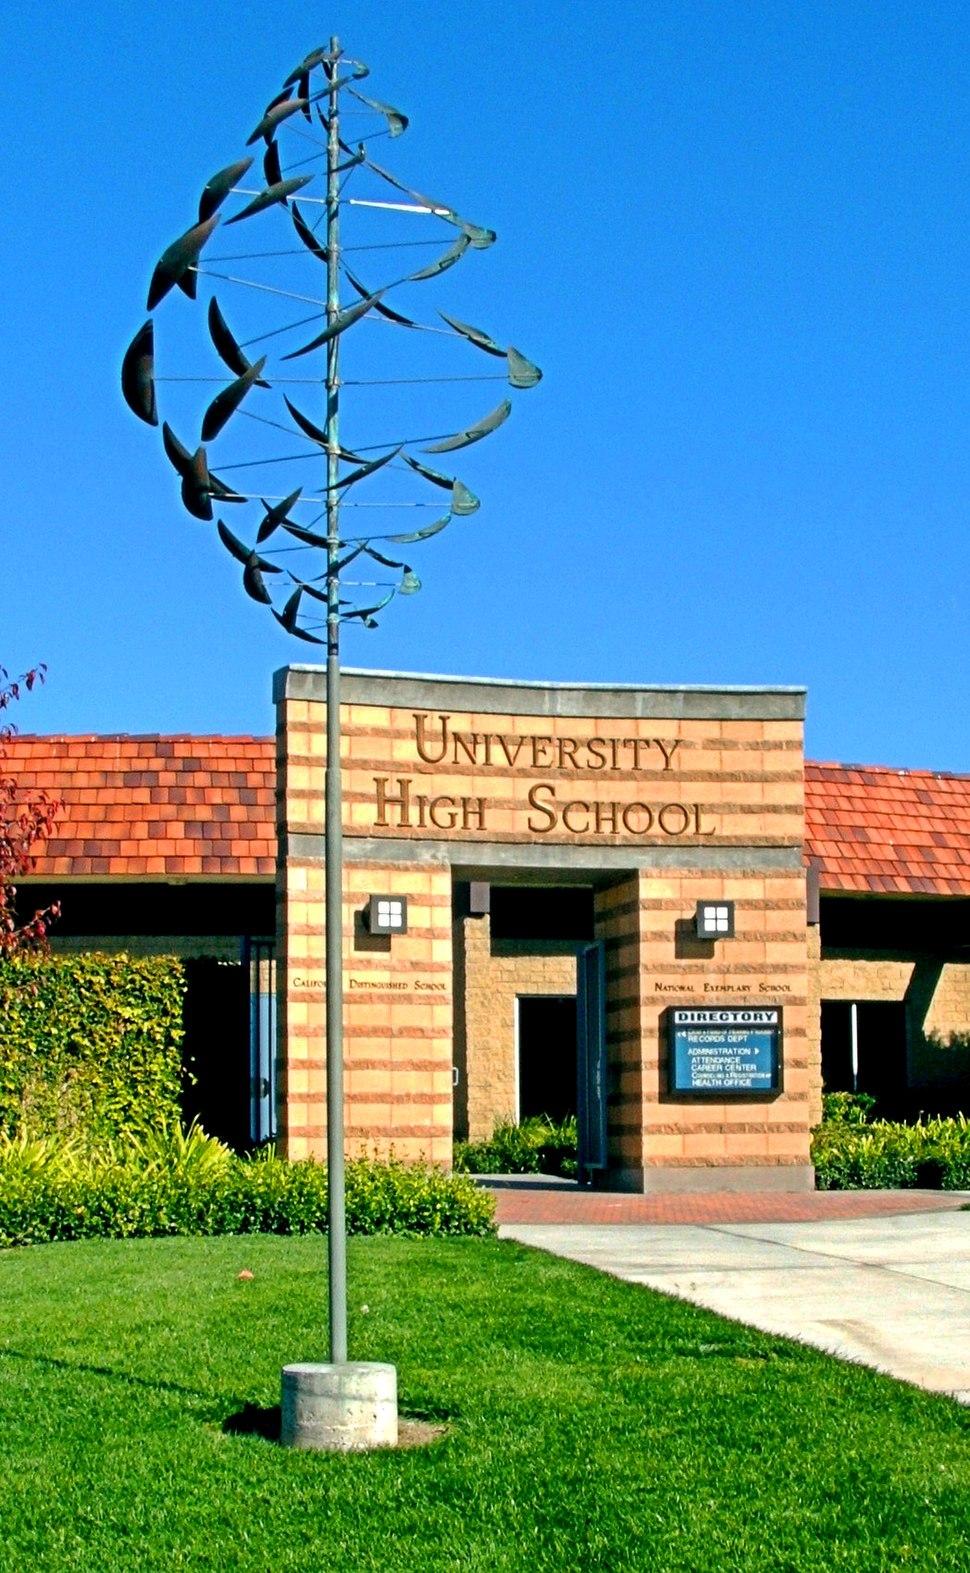 University High, Irvine, Ca - Entrance